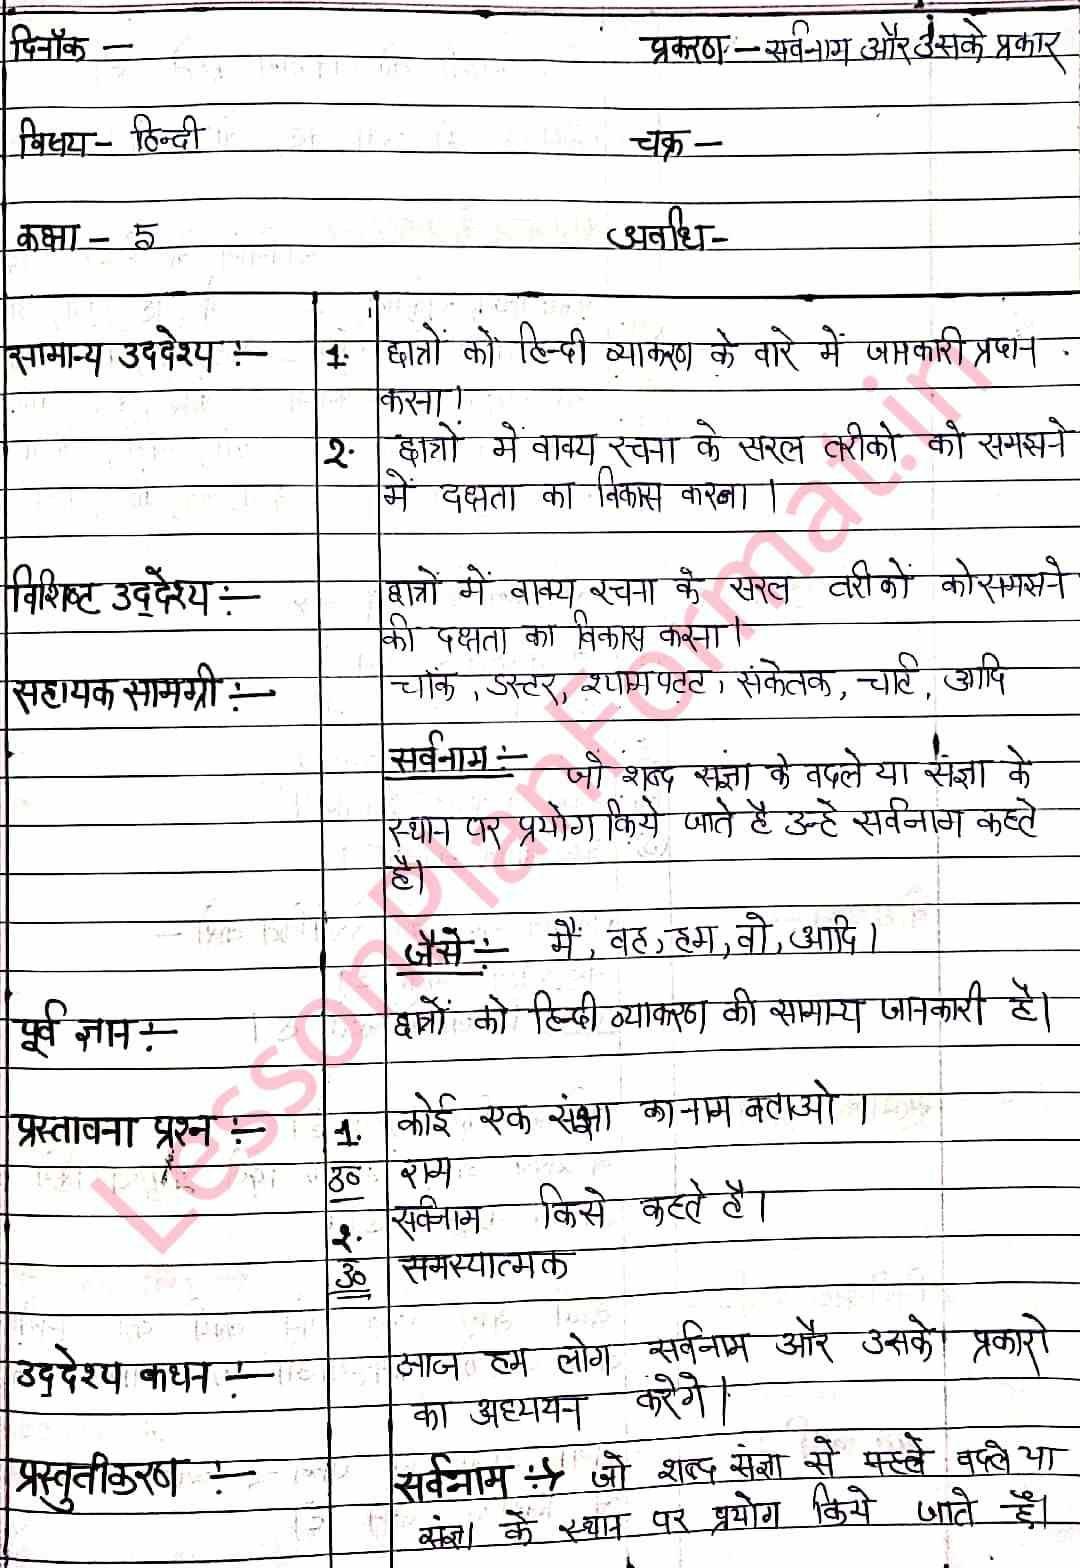 Hindi Vyakran Lesson Plan Sarvnaam Lesson Plan In Hindi How To Plan Lesson Plan Sample [ 1568 x 1080 Pixel ]